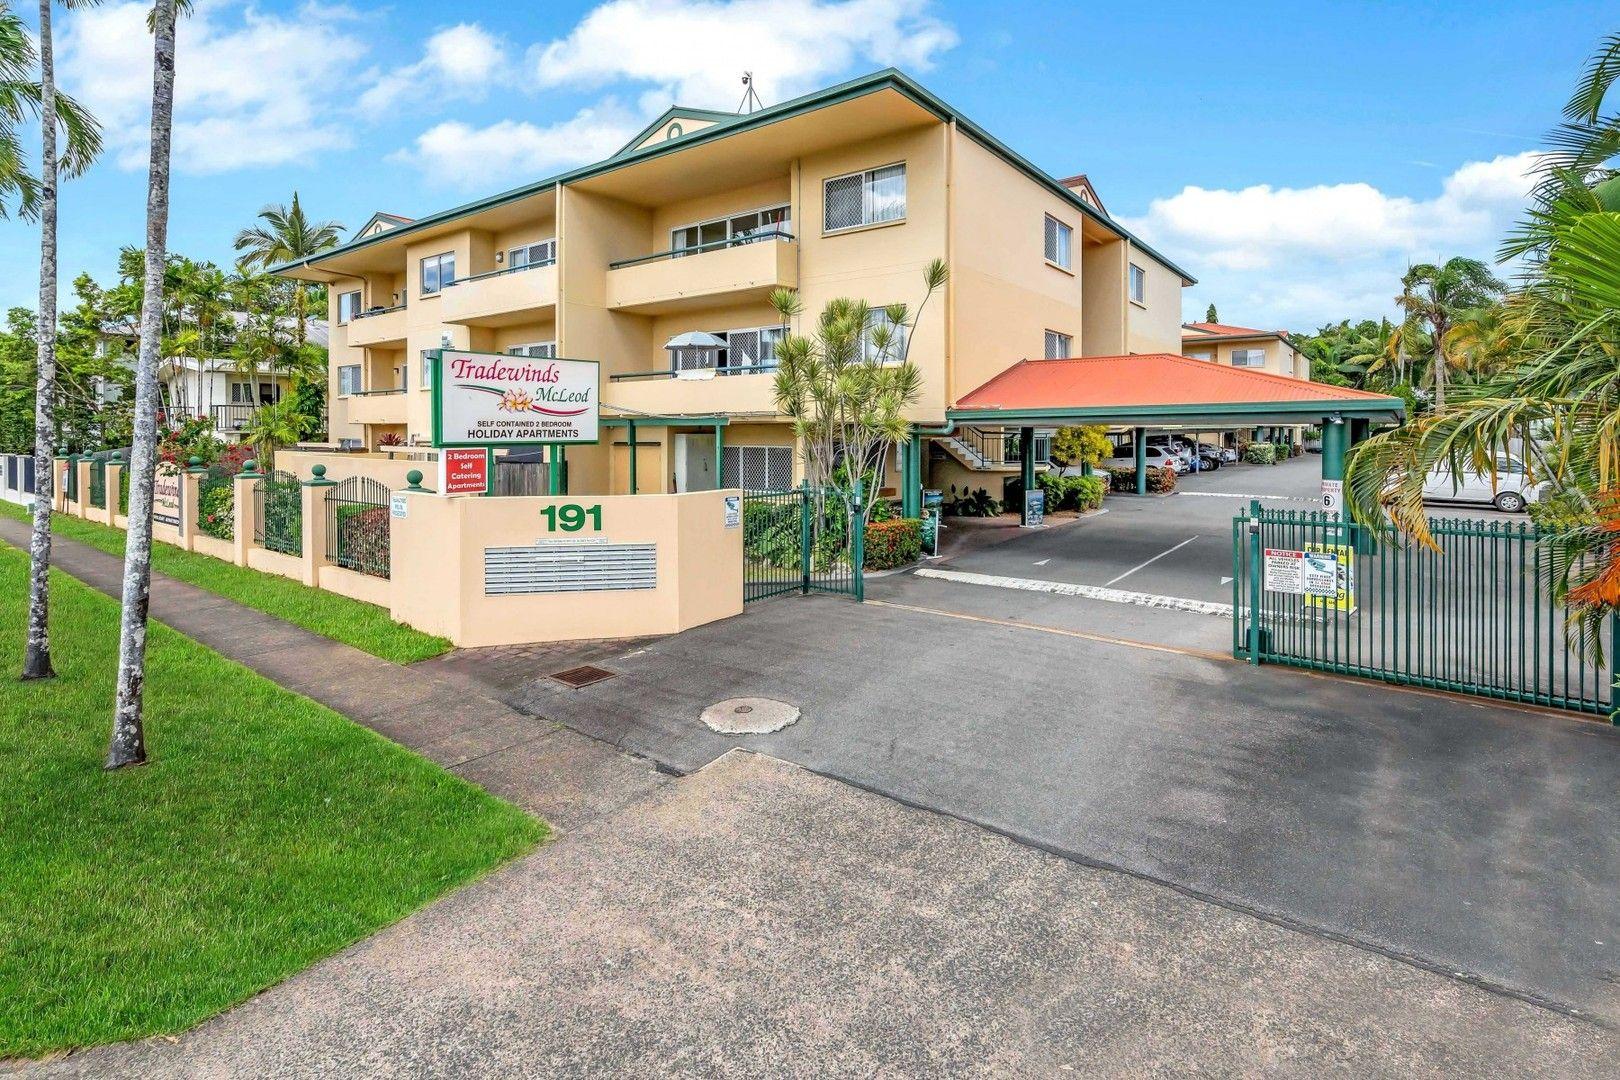 212/191-193 McLeod Street, Cairns City QLD 4870, Image 0